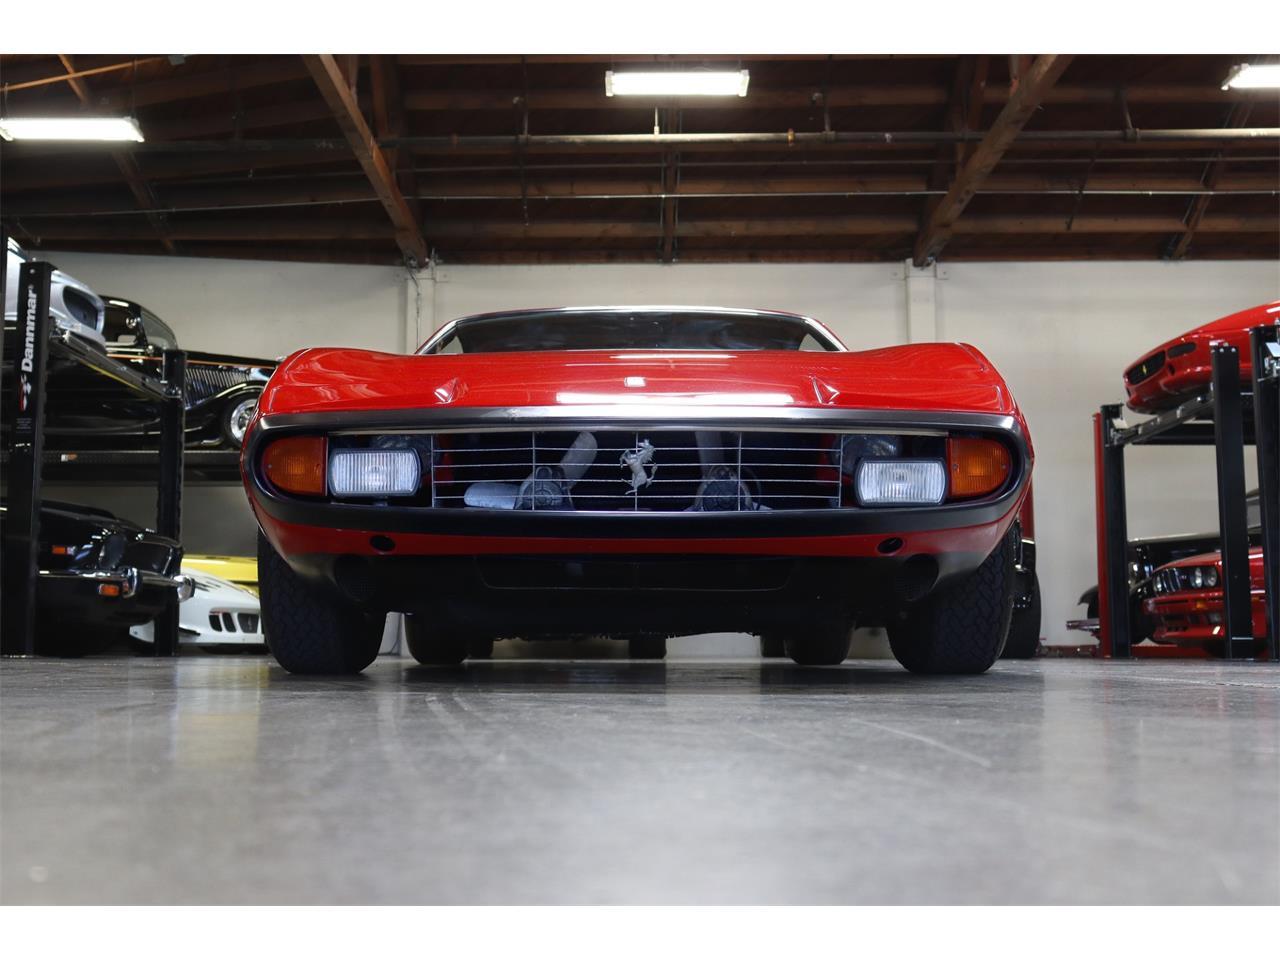 1972 Ferrari 365 GT4 (CC-1392186) for sale in San Carlos, California